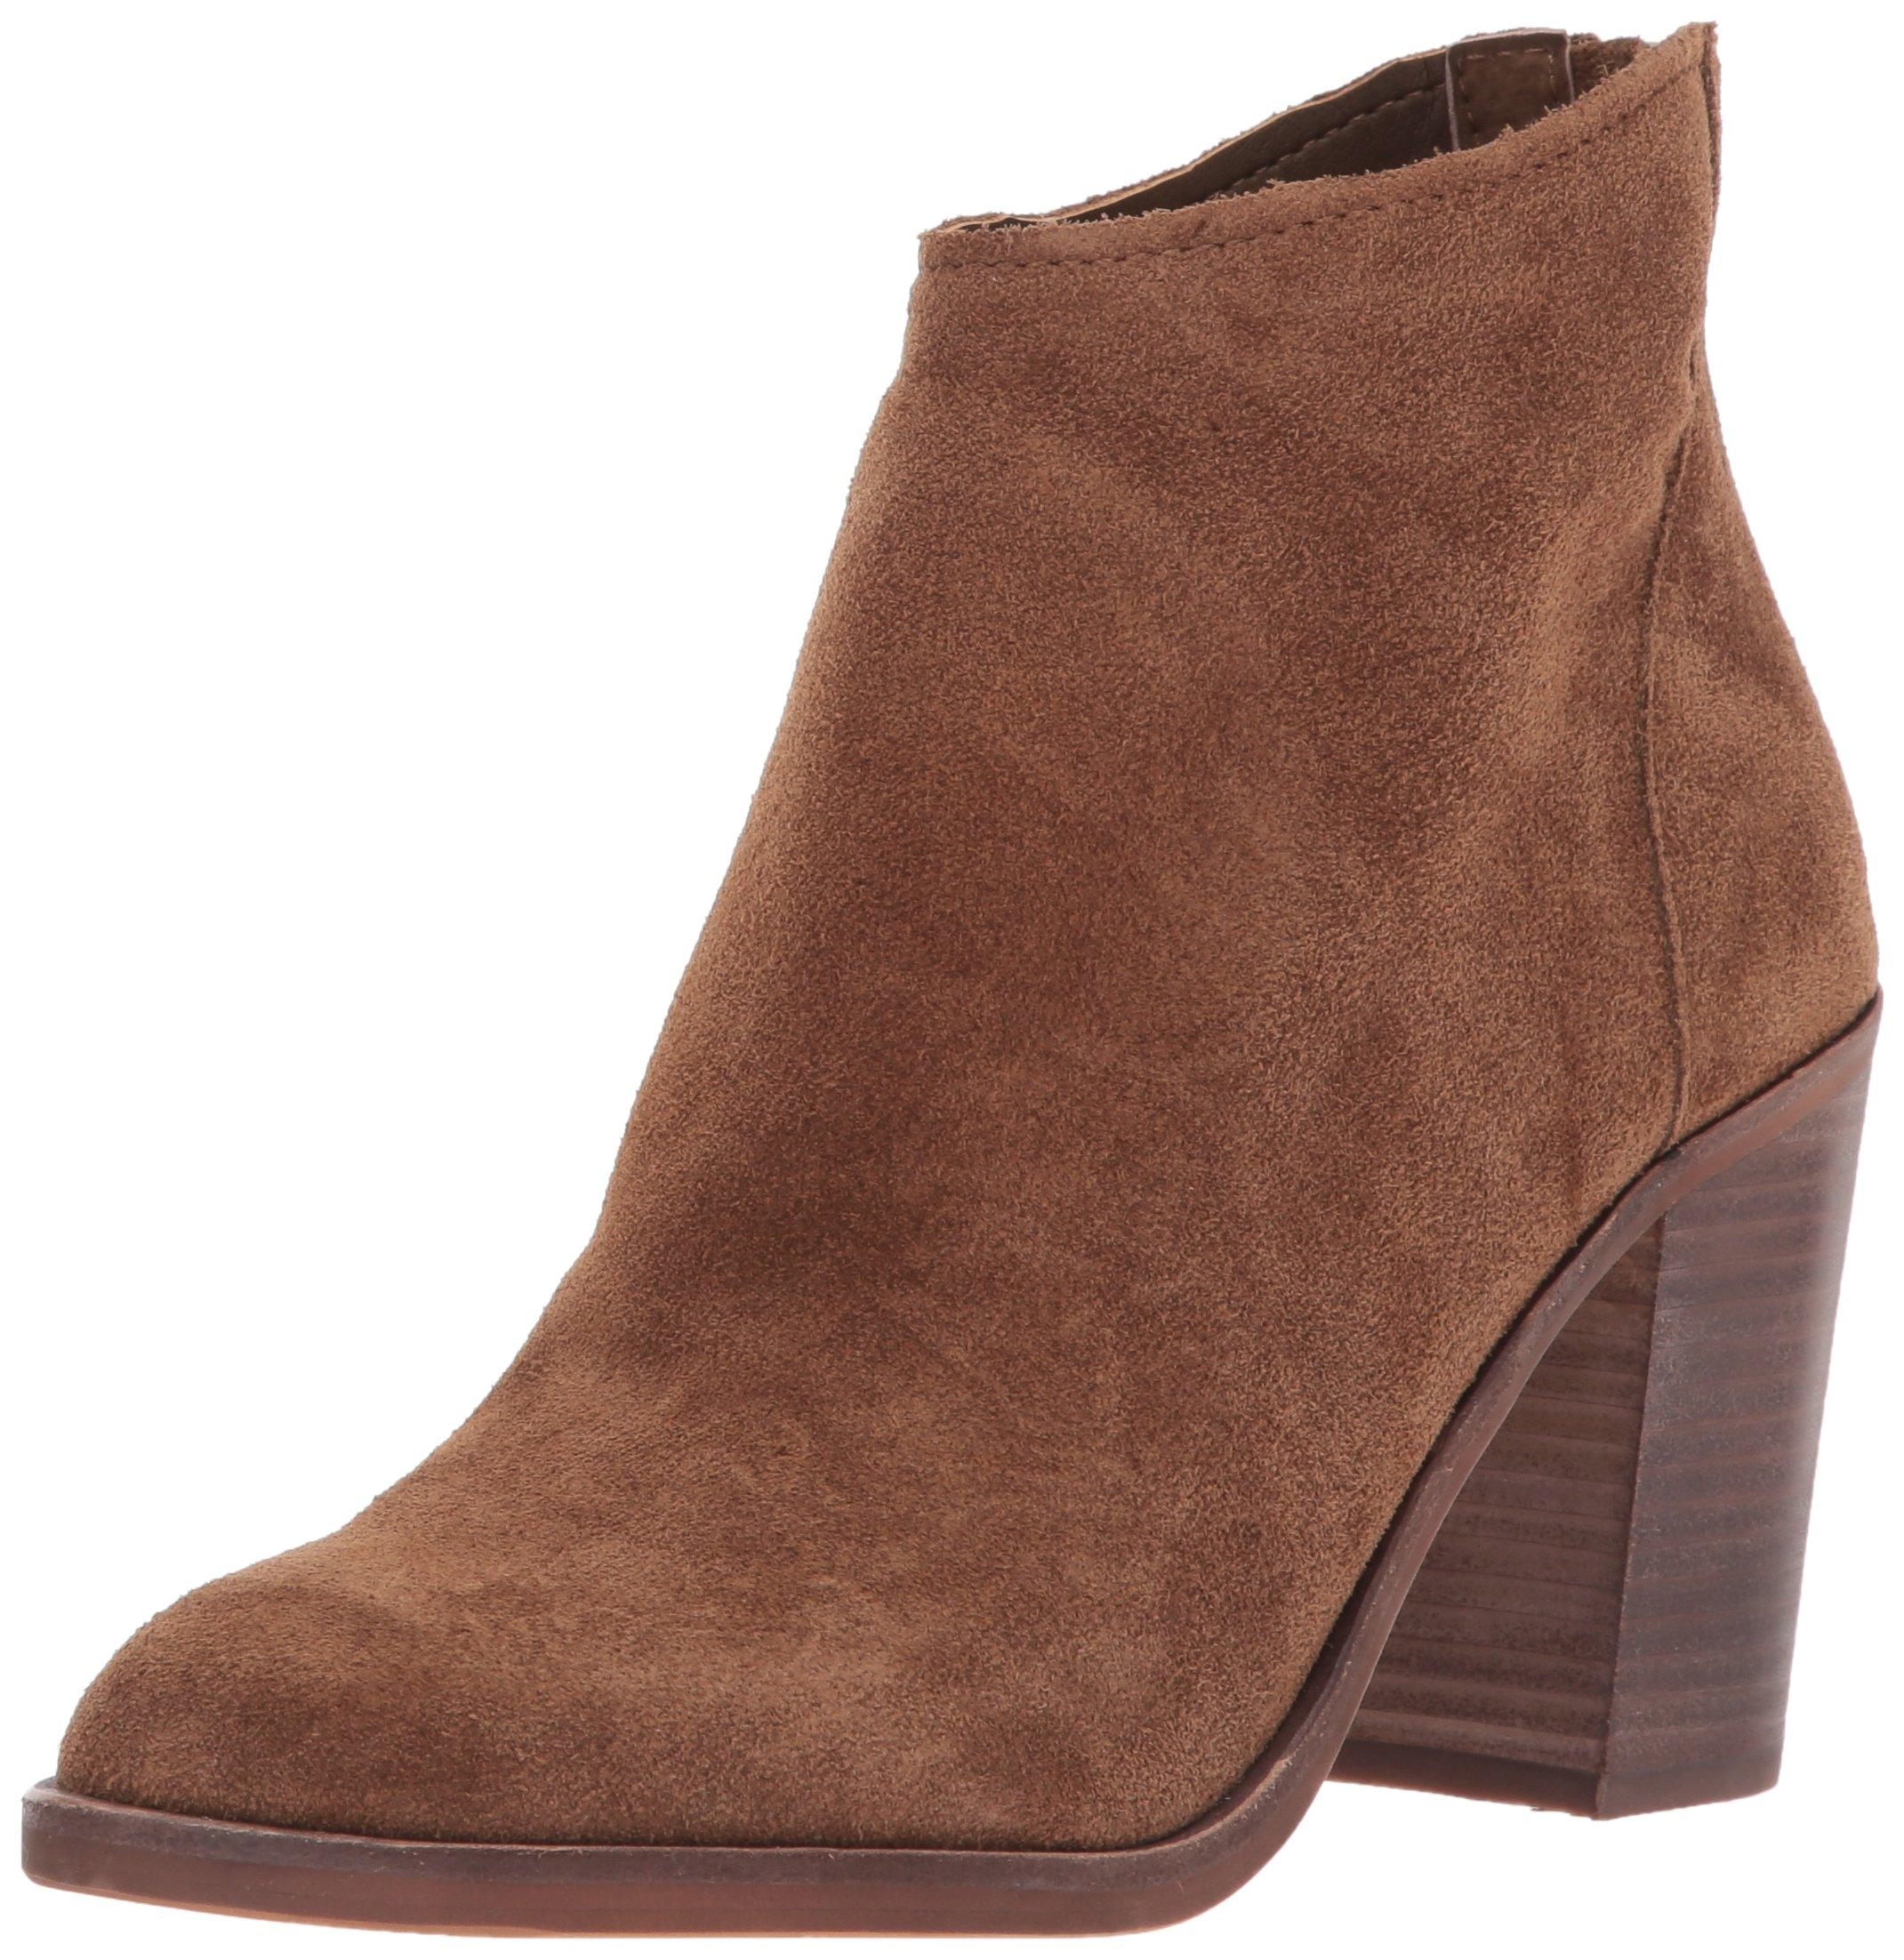 Dolce Vita Women's Stevie Ankle Boot, DK Brown Suede, 7 Medium US